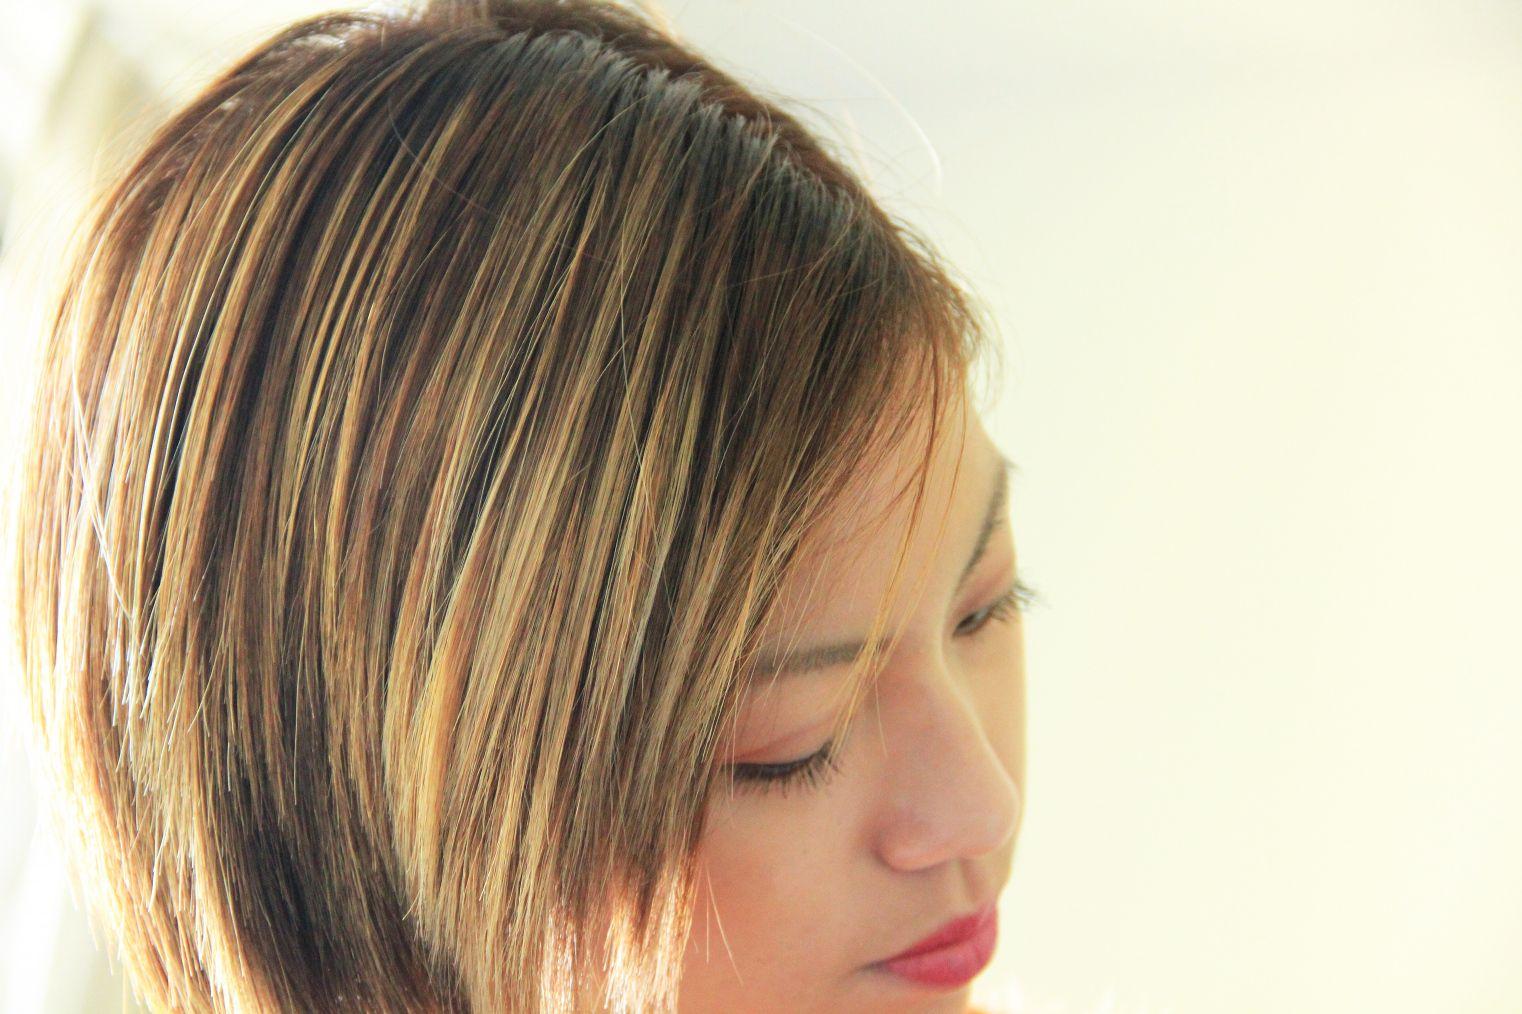 Kolours Hair Color Caramel Brown Review Best Safe Hair Color Check